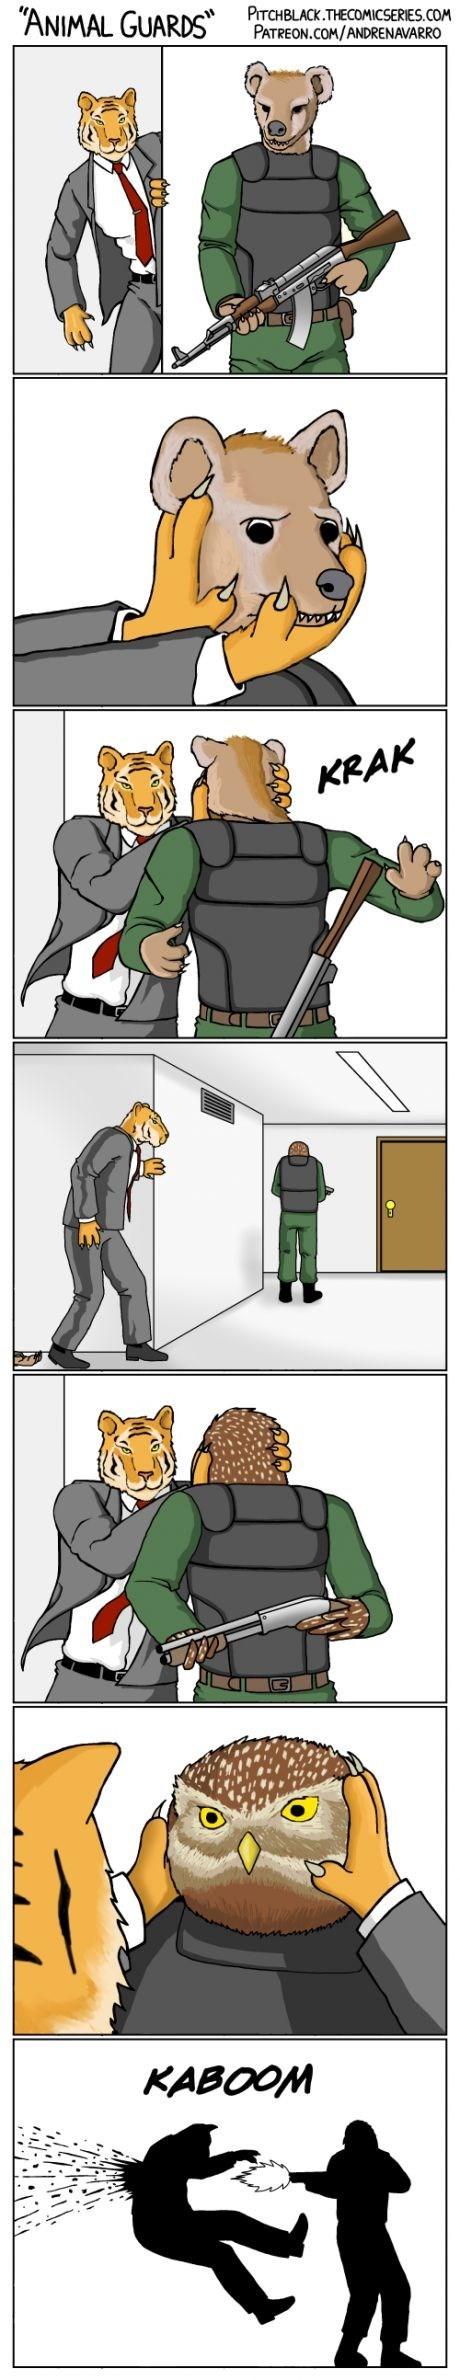 web comics owls Never Let Your Guard Down